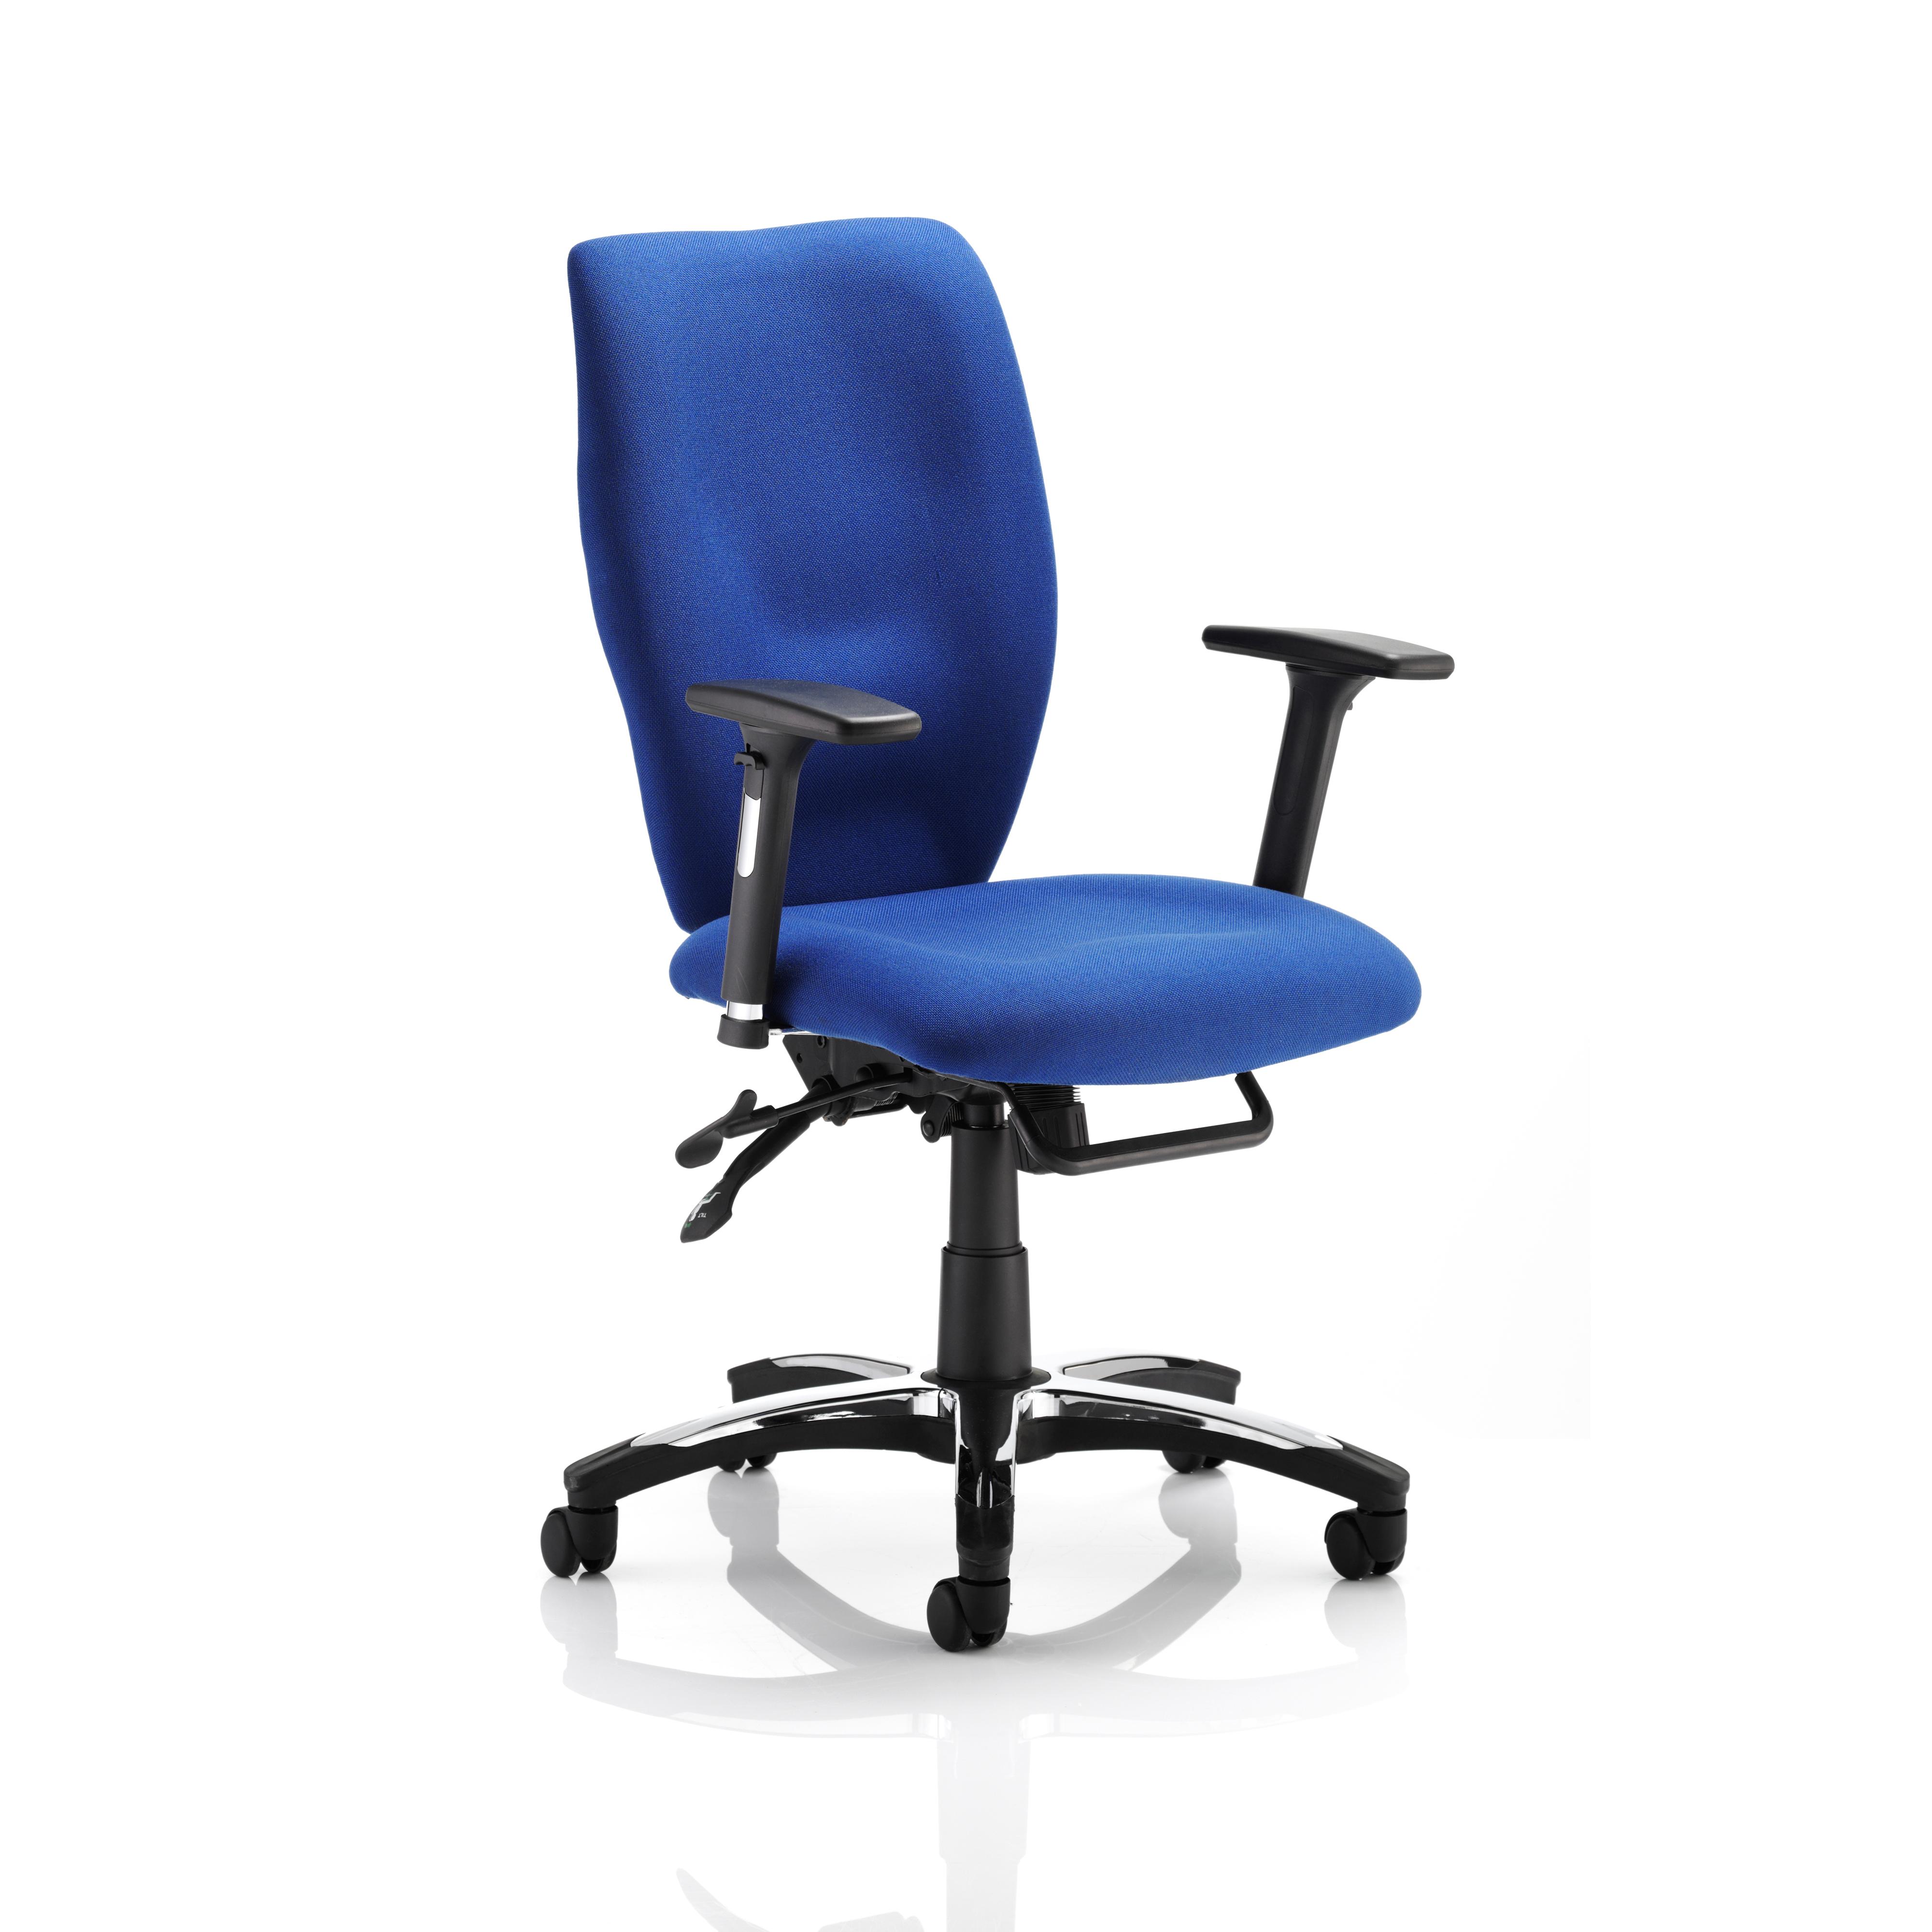 Sonix Sierra Chair Blue 520x470-530x450-550mm Ref OP000177